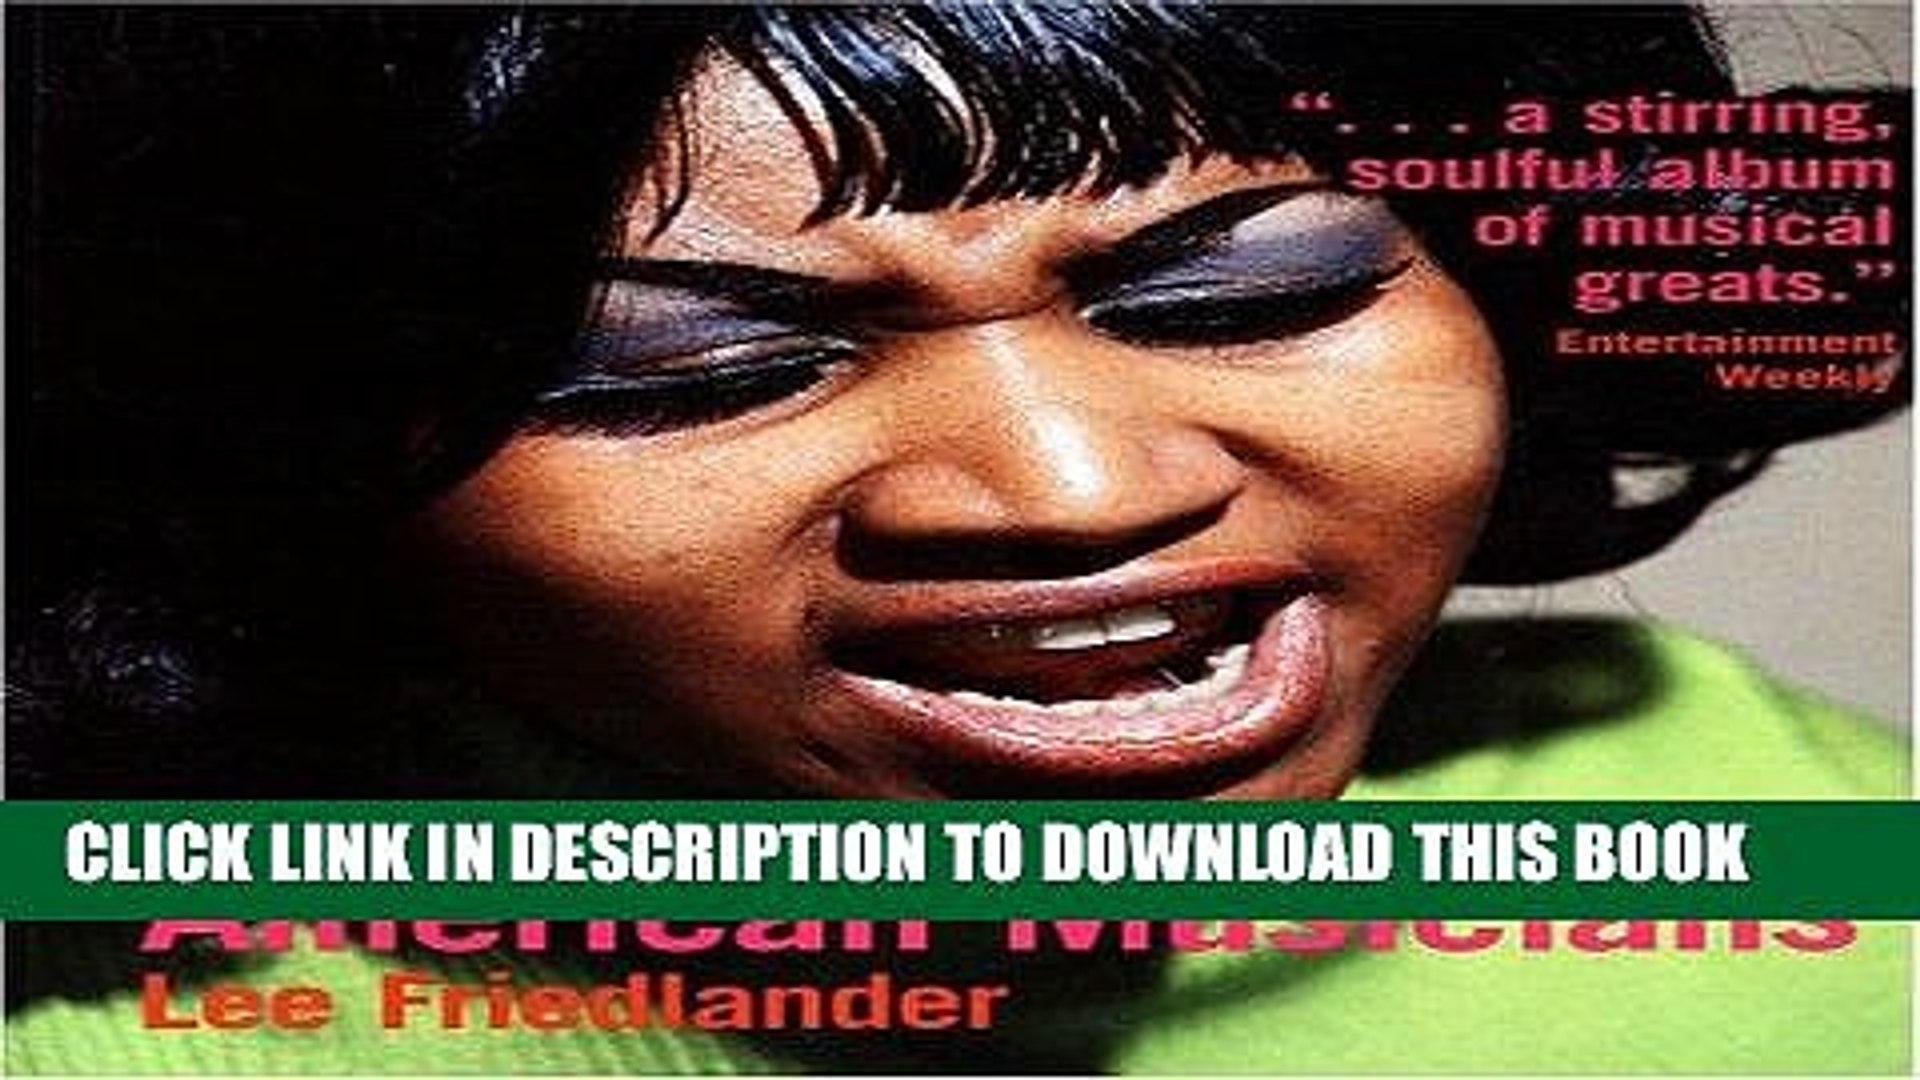 [PDF] Lee Friedlander: American Musicians Full Online